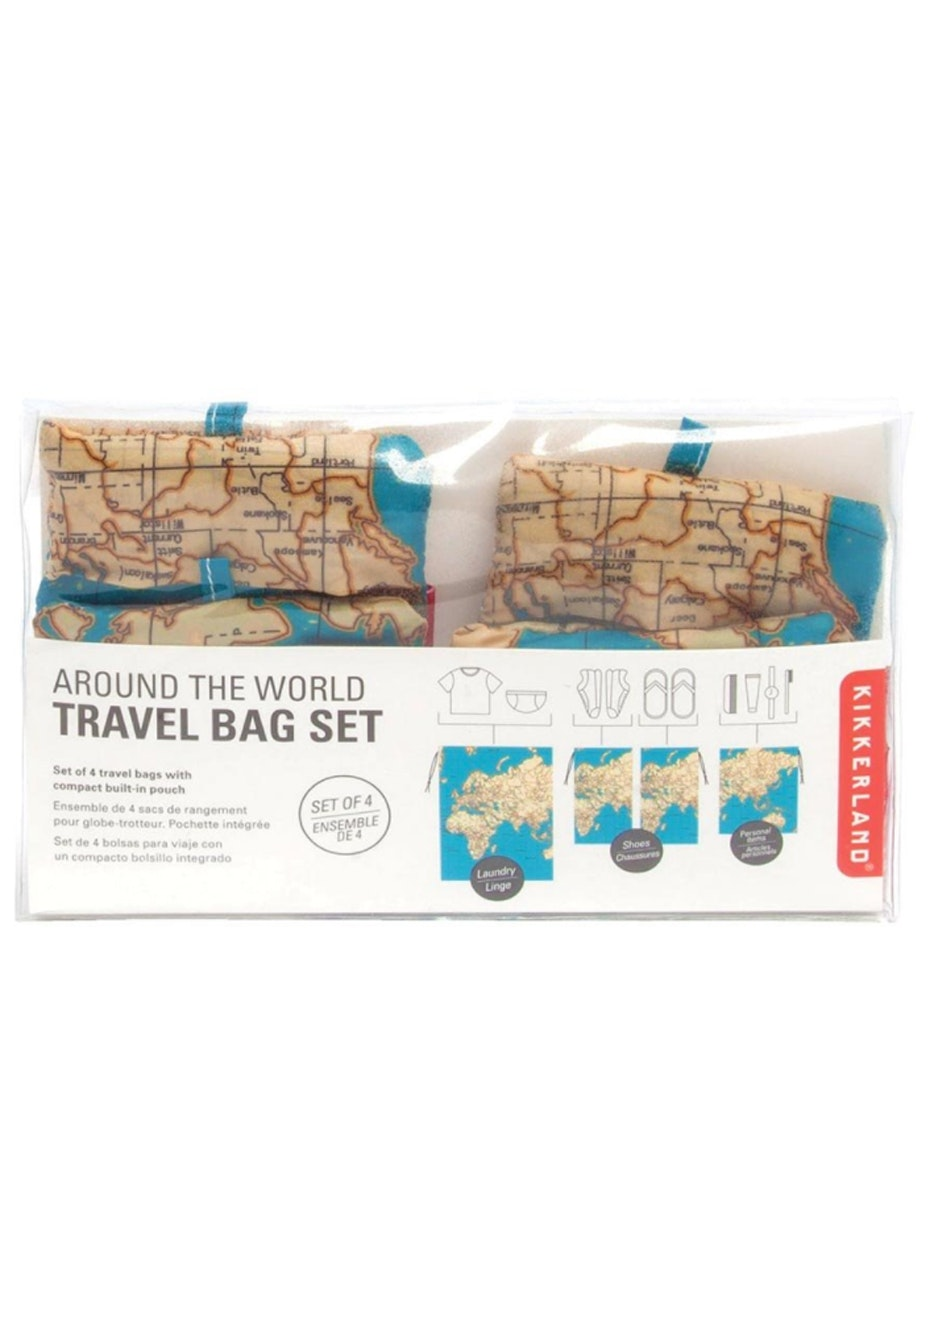 Around The World Travel Bag Set - 4 Piece Set